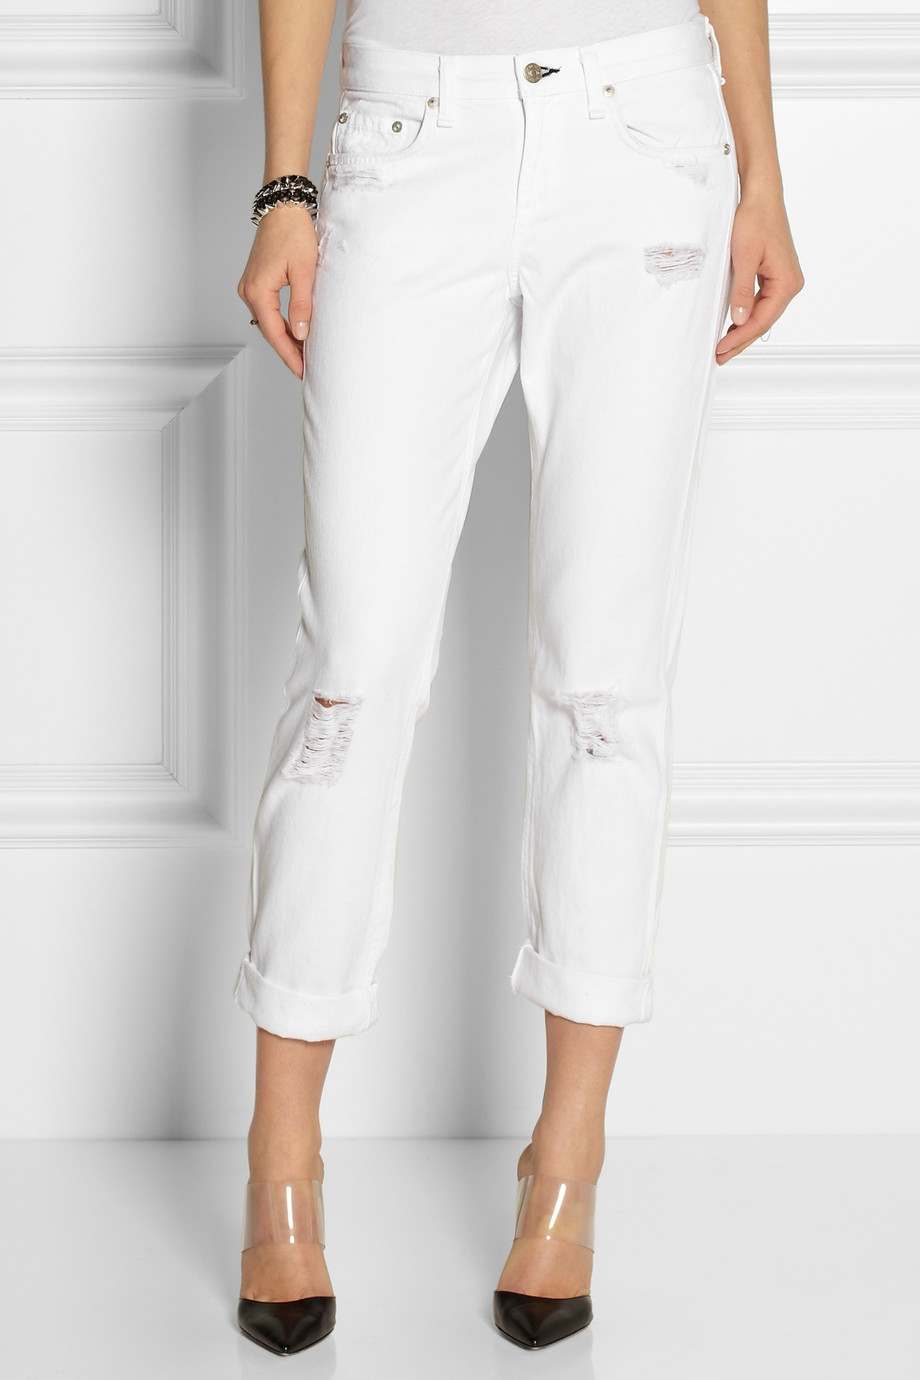 Rag & bone Distressed Cropped Boyfriend Jeans in White | Lyst